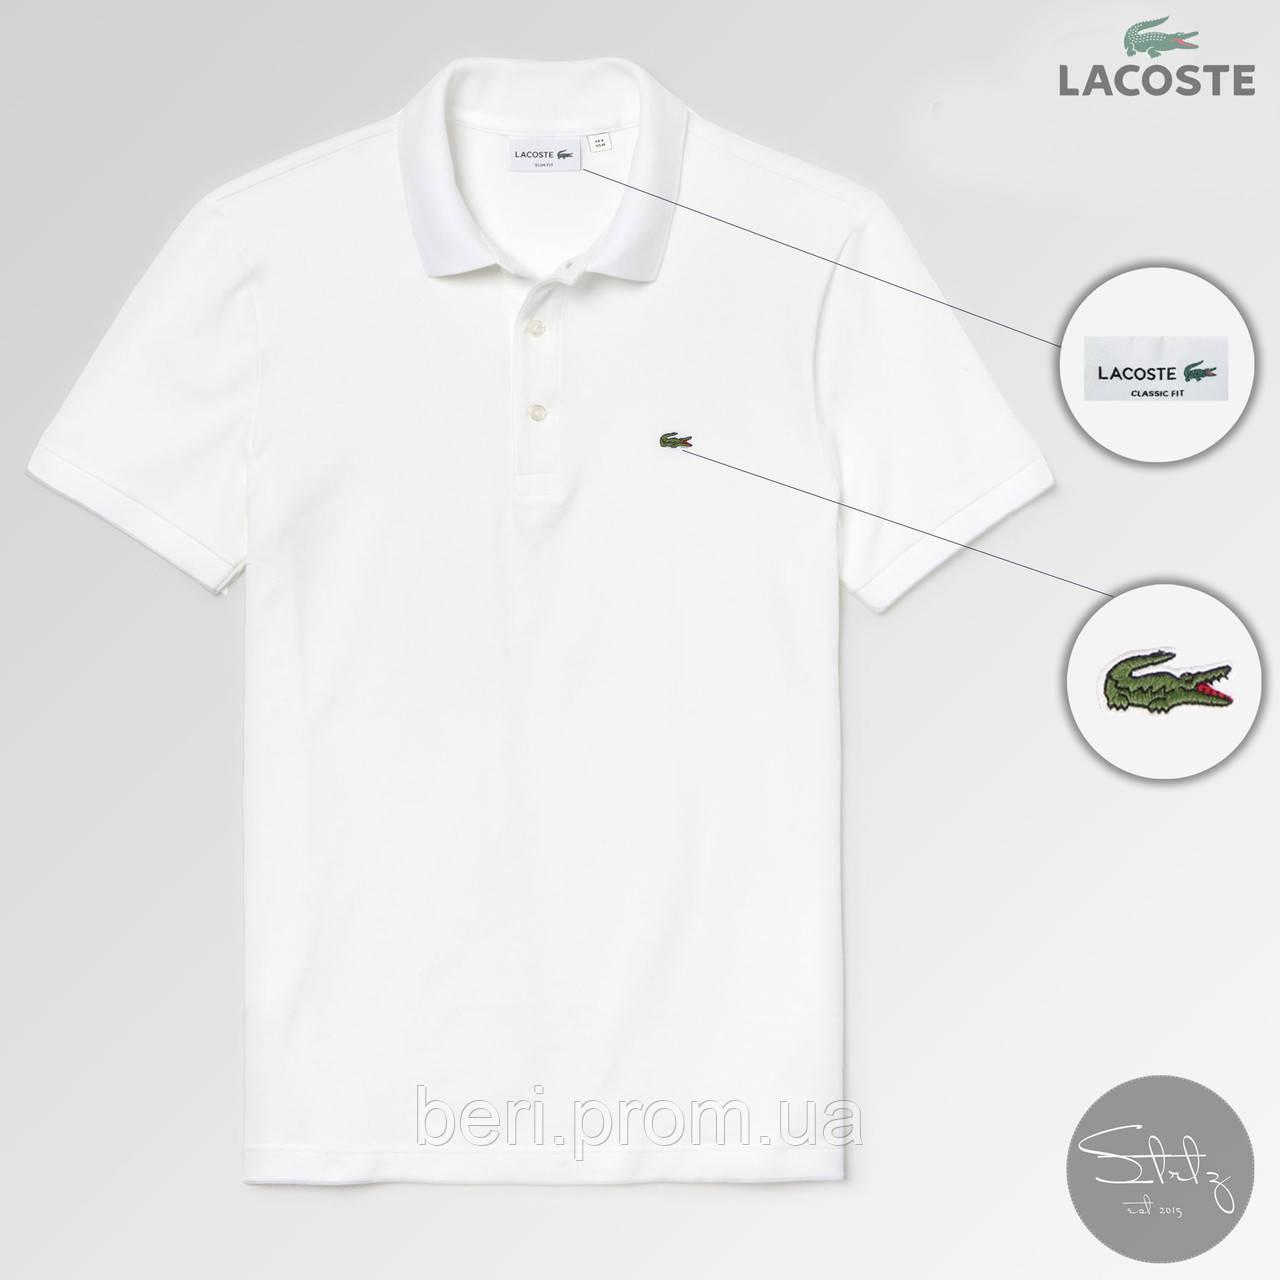 Мужская футболка тениска поло Lacoste | Чоловіча теніска поло Лакоста (Белый)